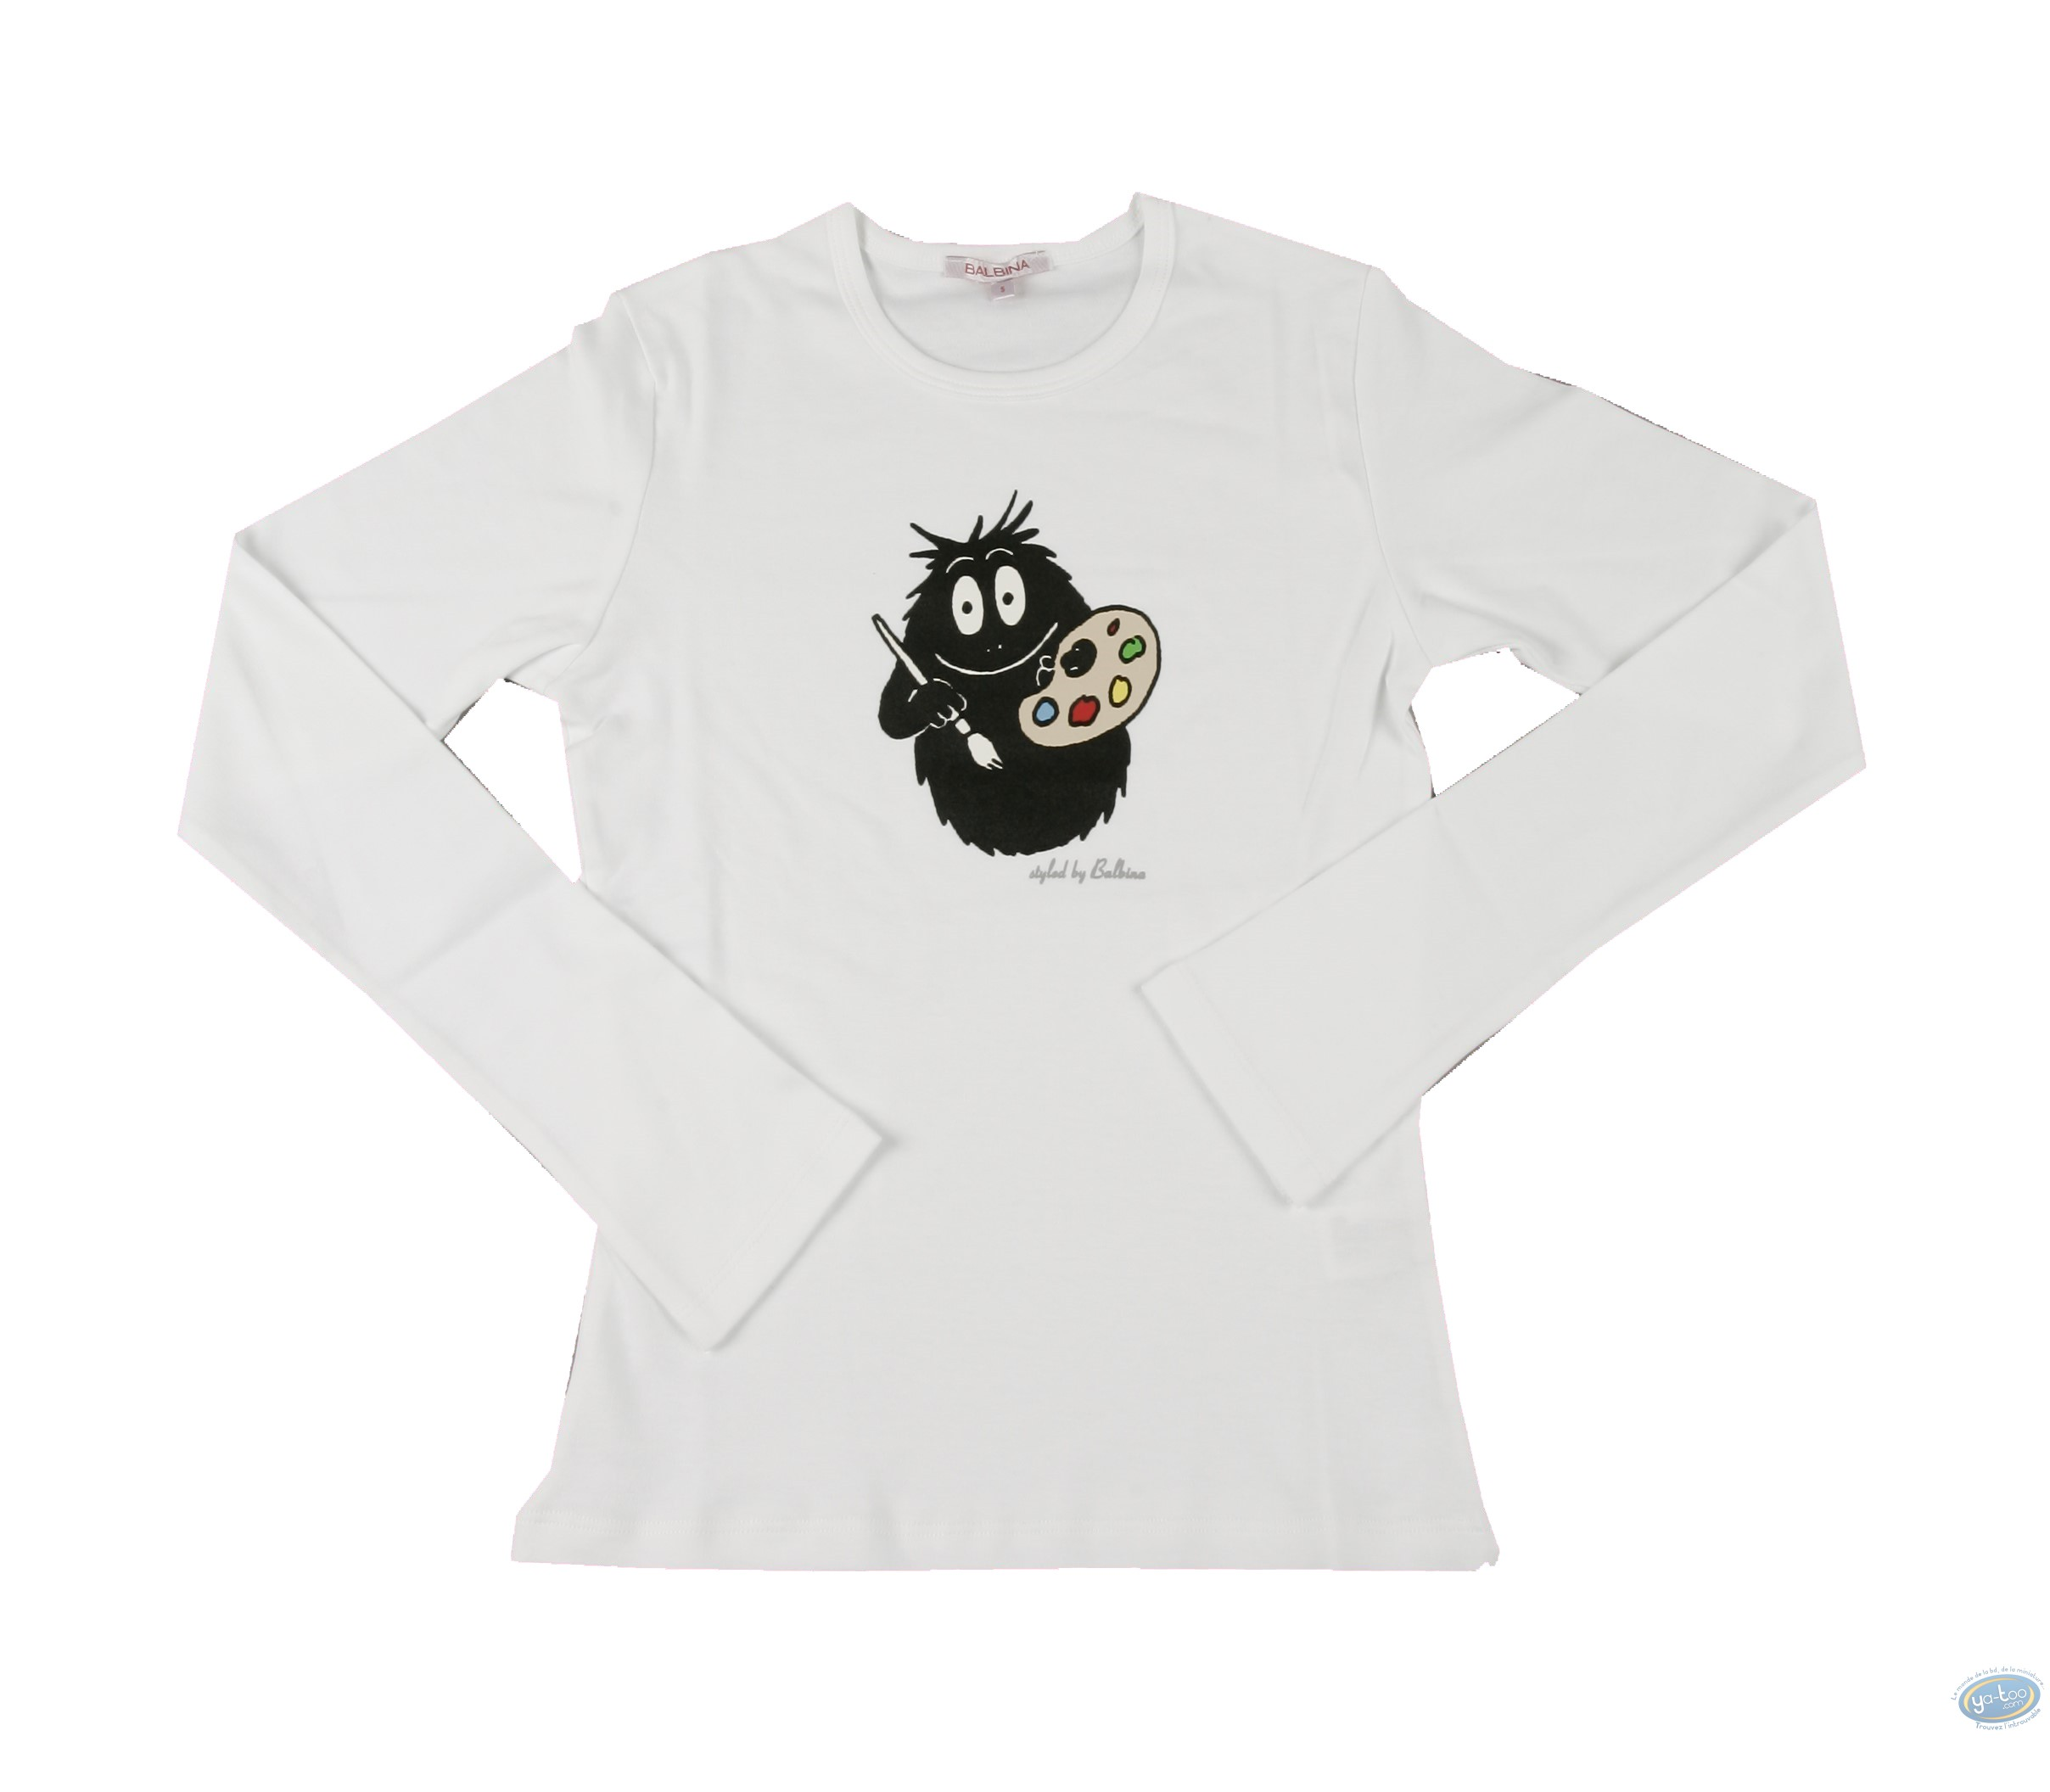 Clothes, Barbapapa : T-shirt long-sleeve white Barbapapa: size XS, painter